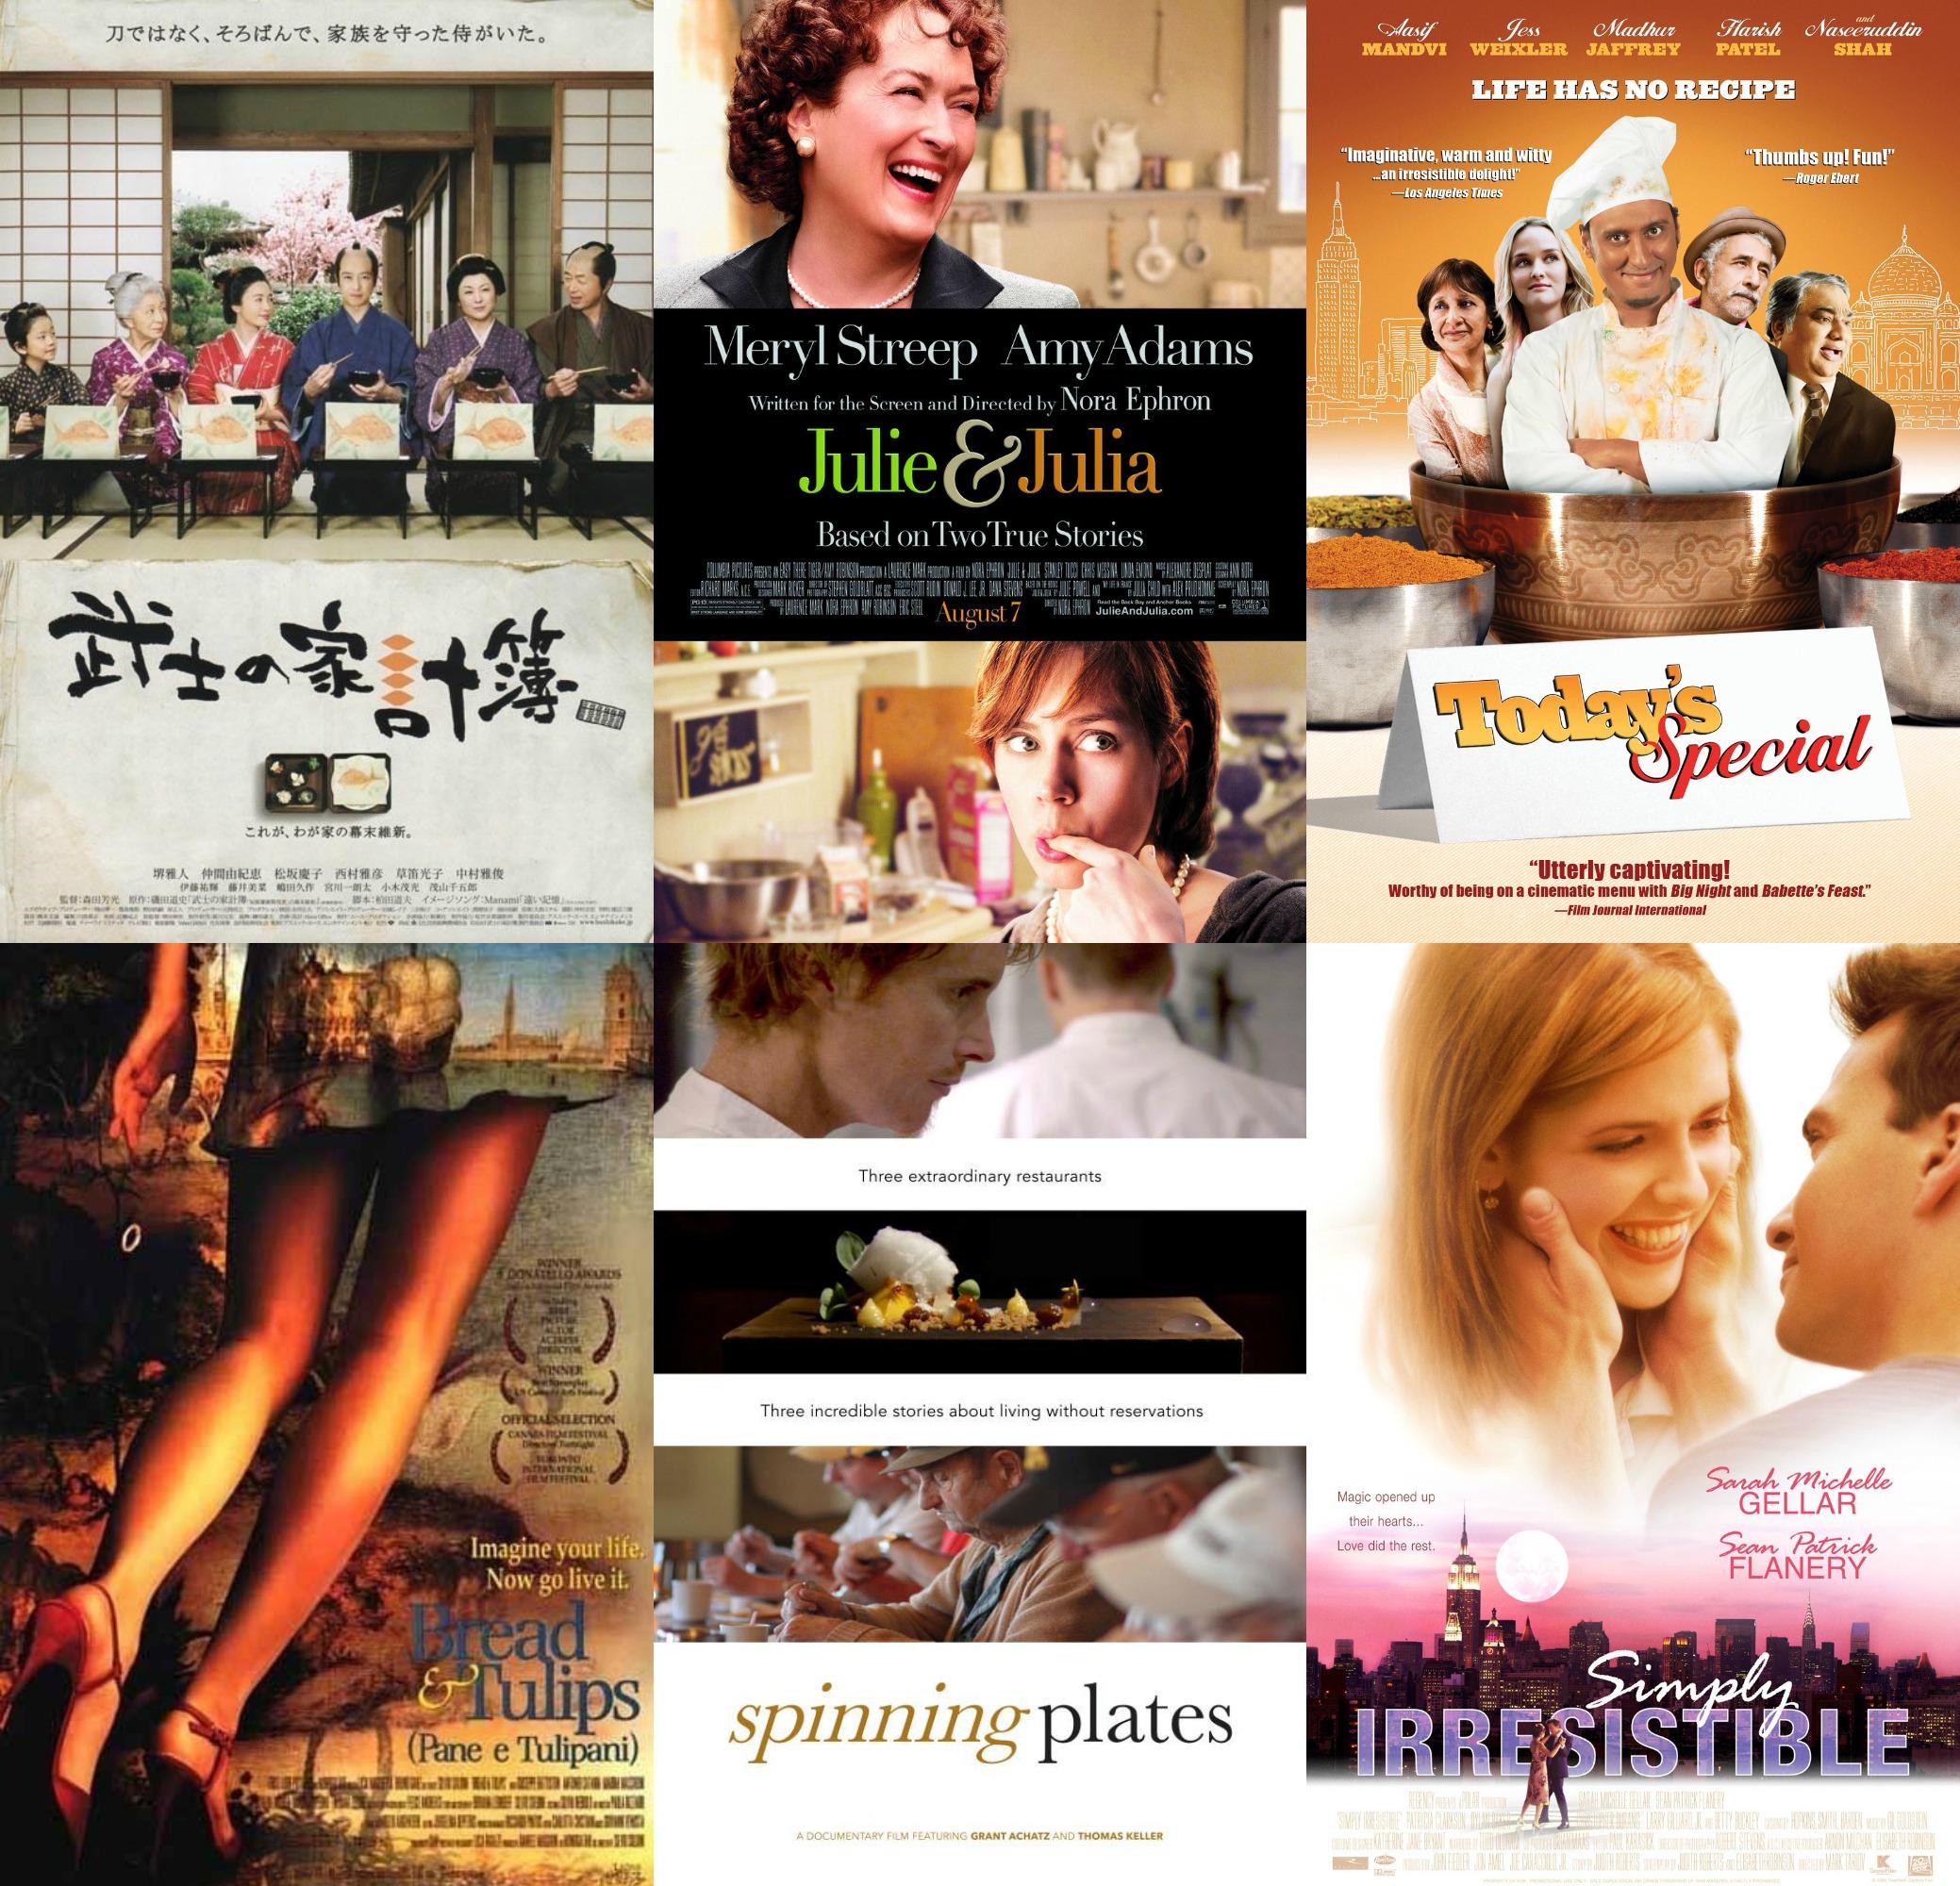 Intermission Binge Watching Food Movies